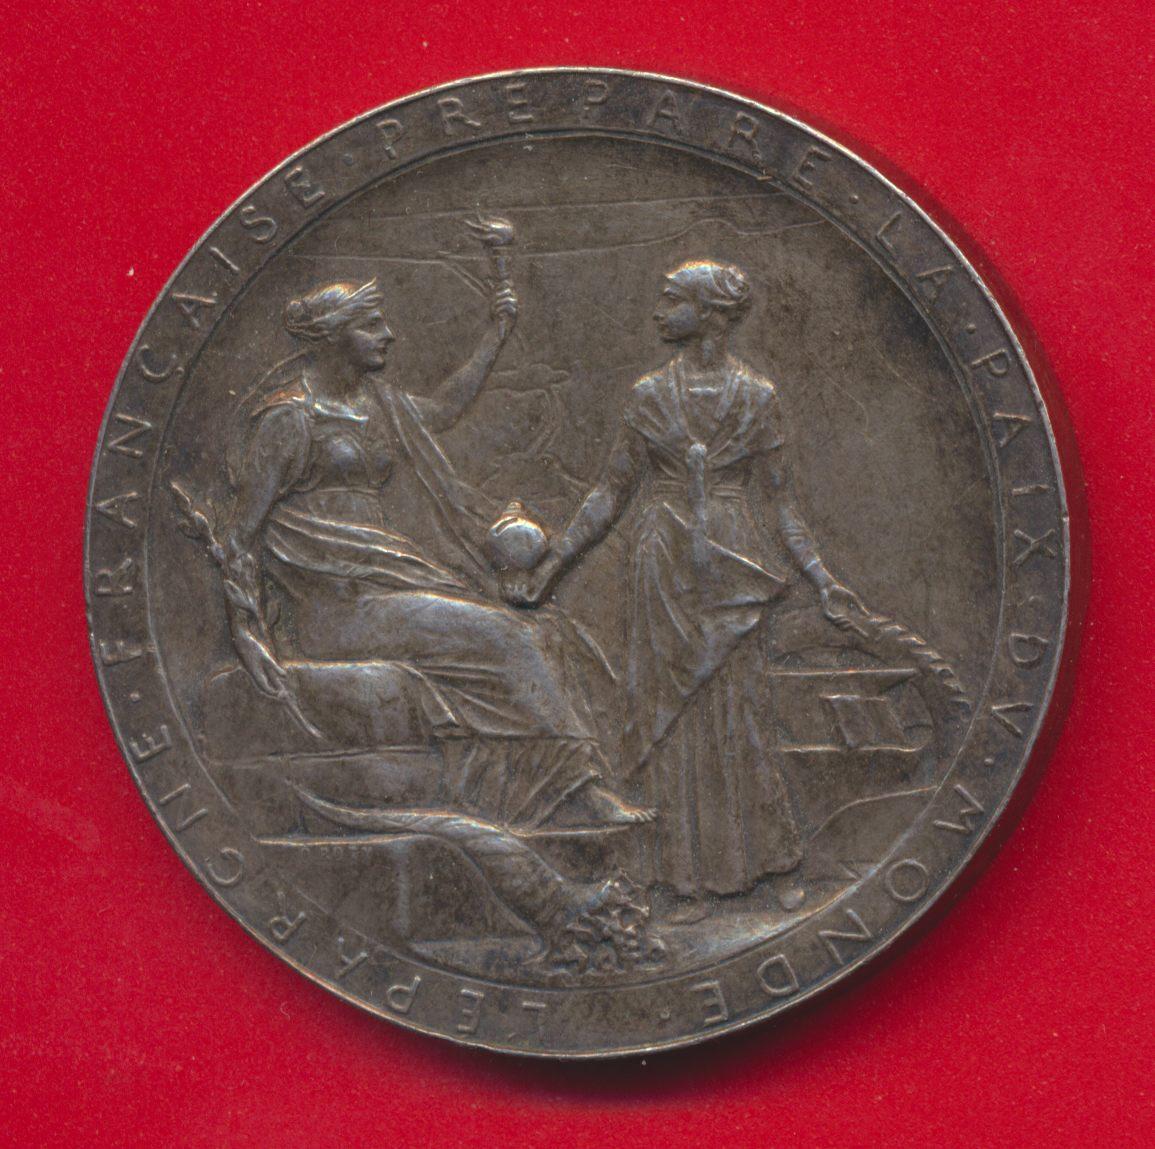 medaille-canal-suez-novmebre-1869-compagnie-universelle-maritime-argent